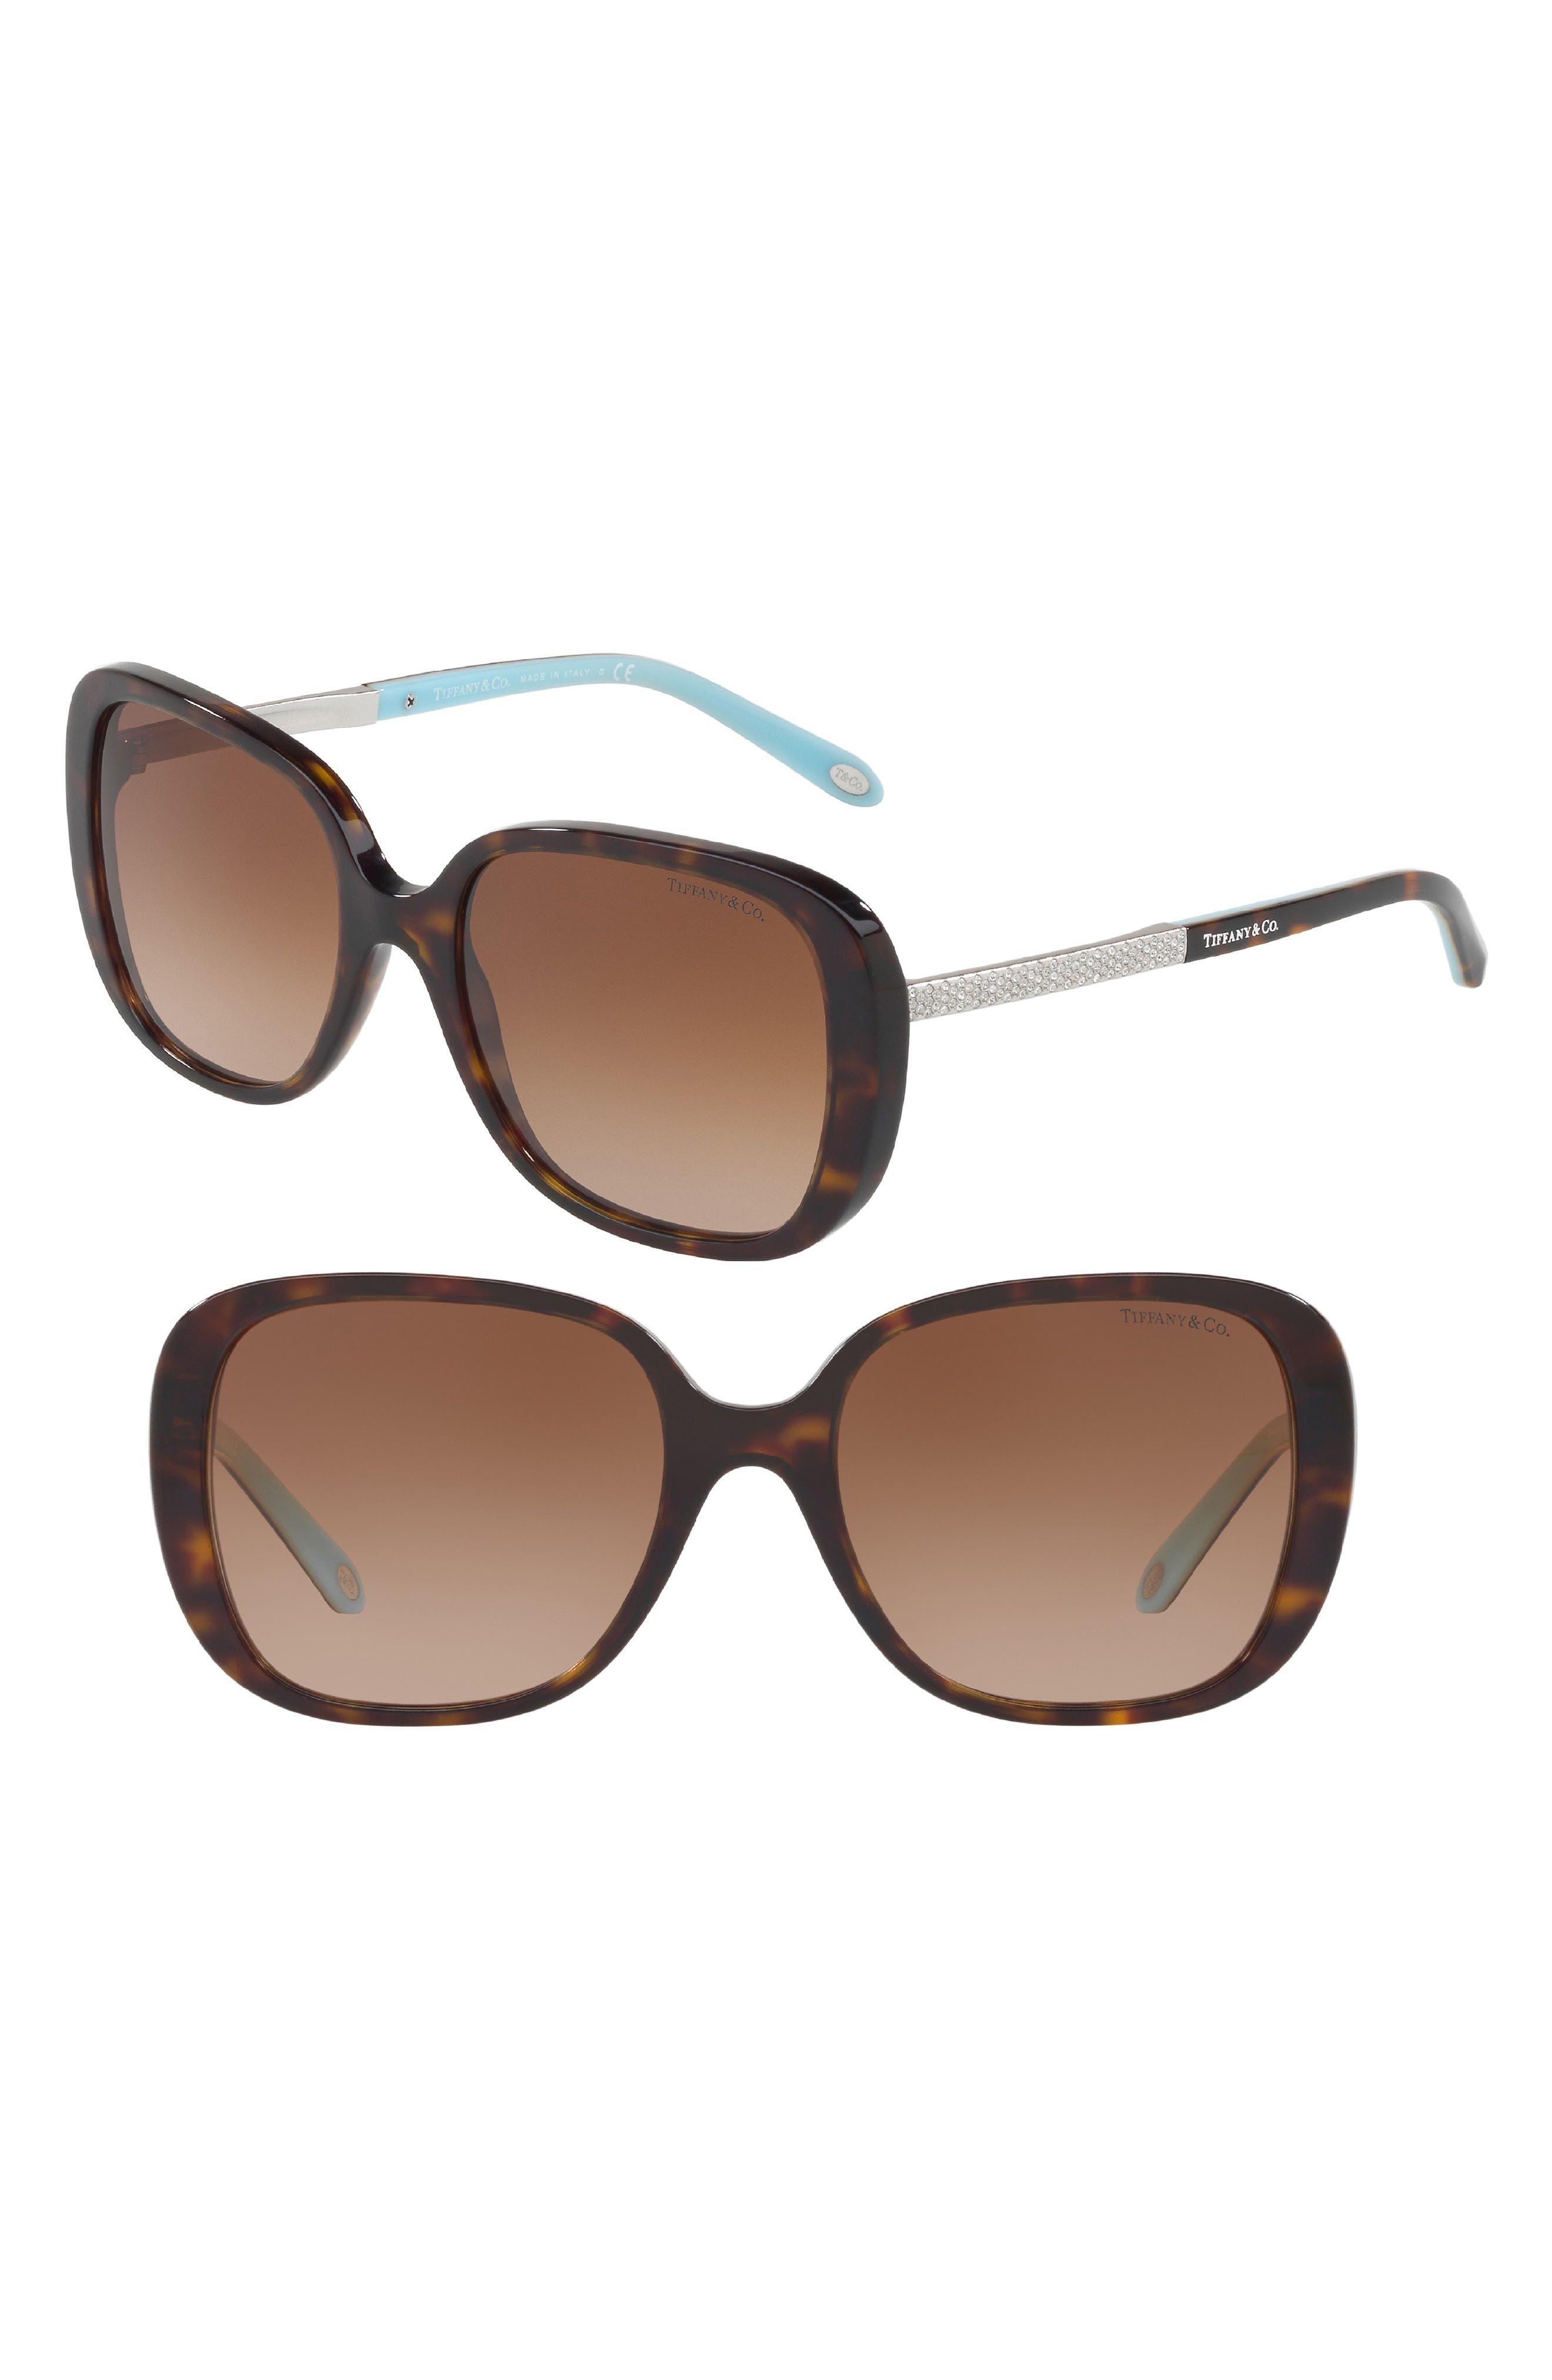 54mm Gradient Sunglasses,                             Main thumbnail 1, color,                             Dark Havana